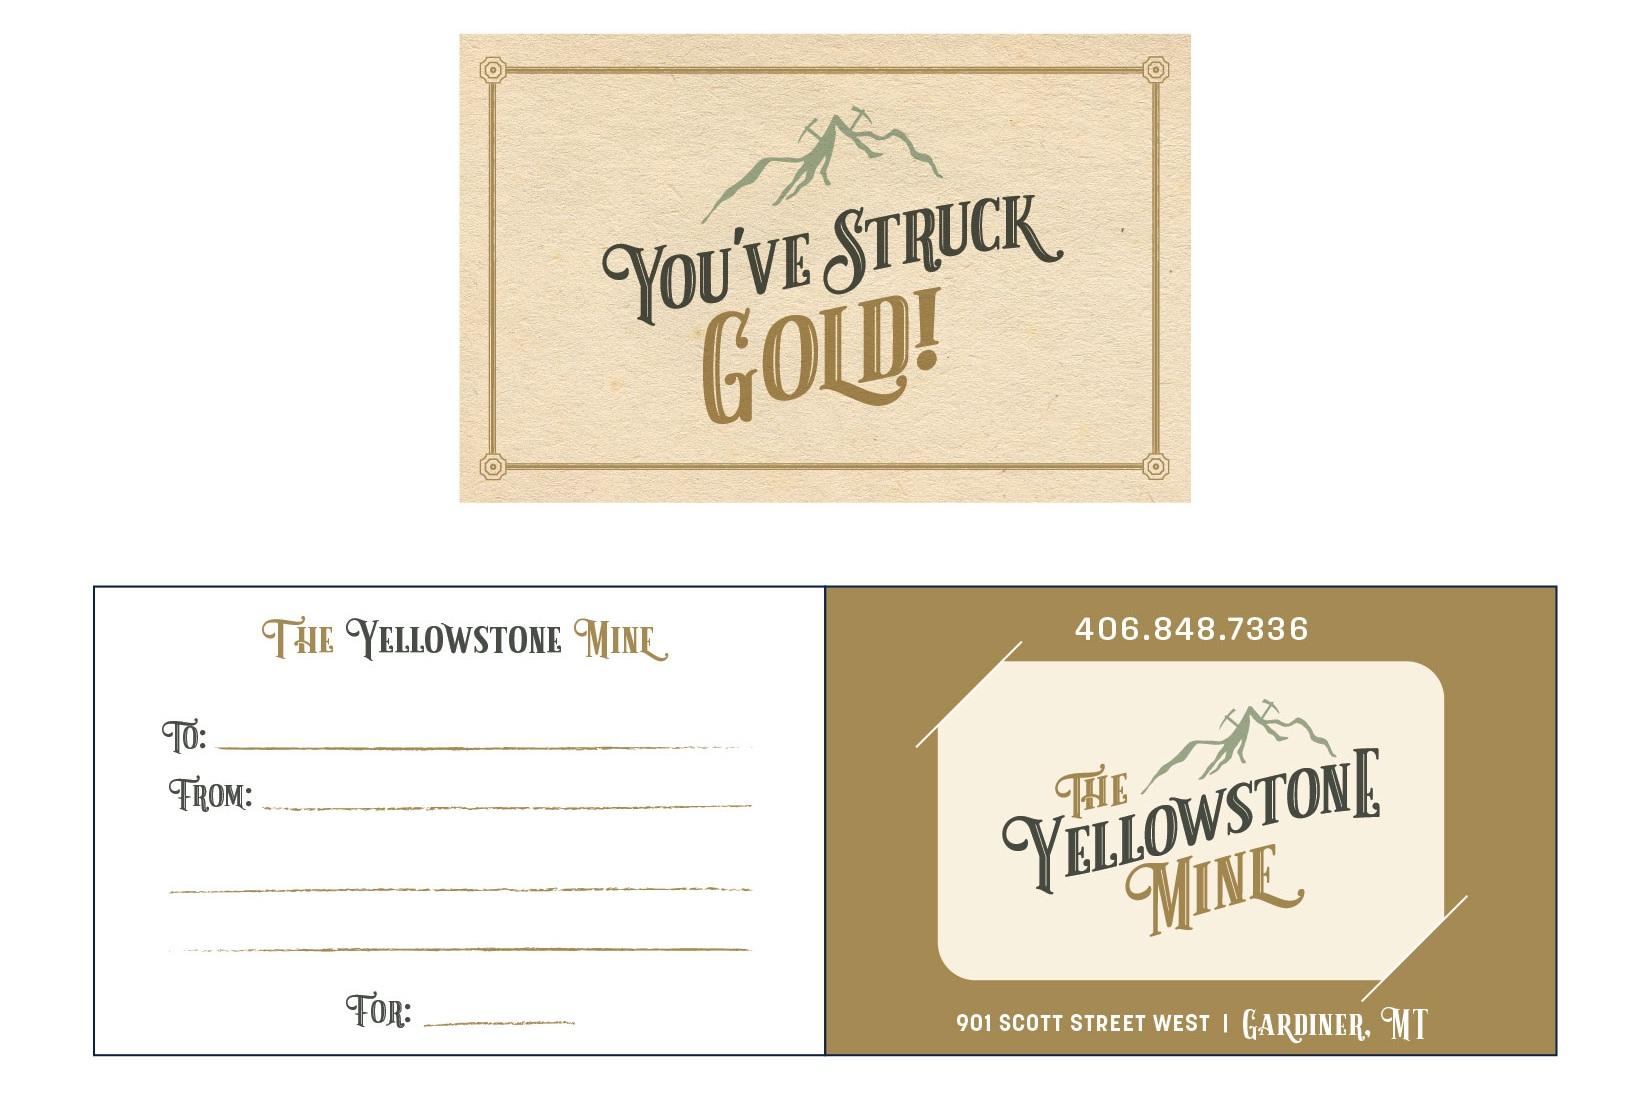 yellowstone_mine_gift_card